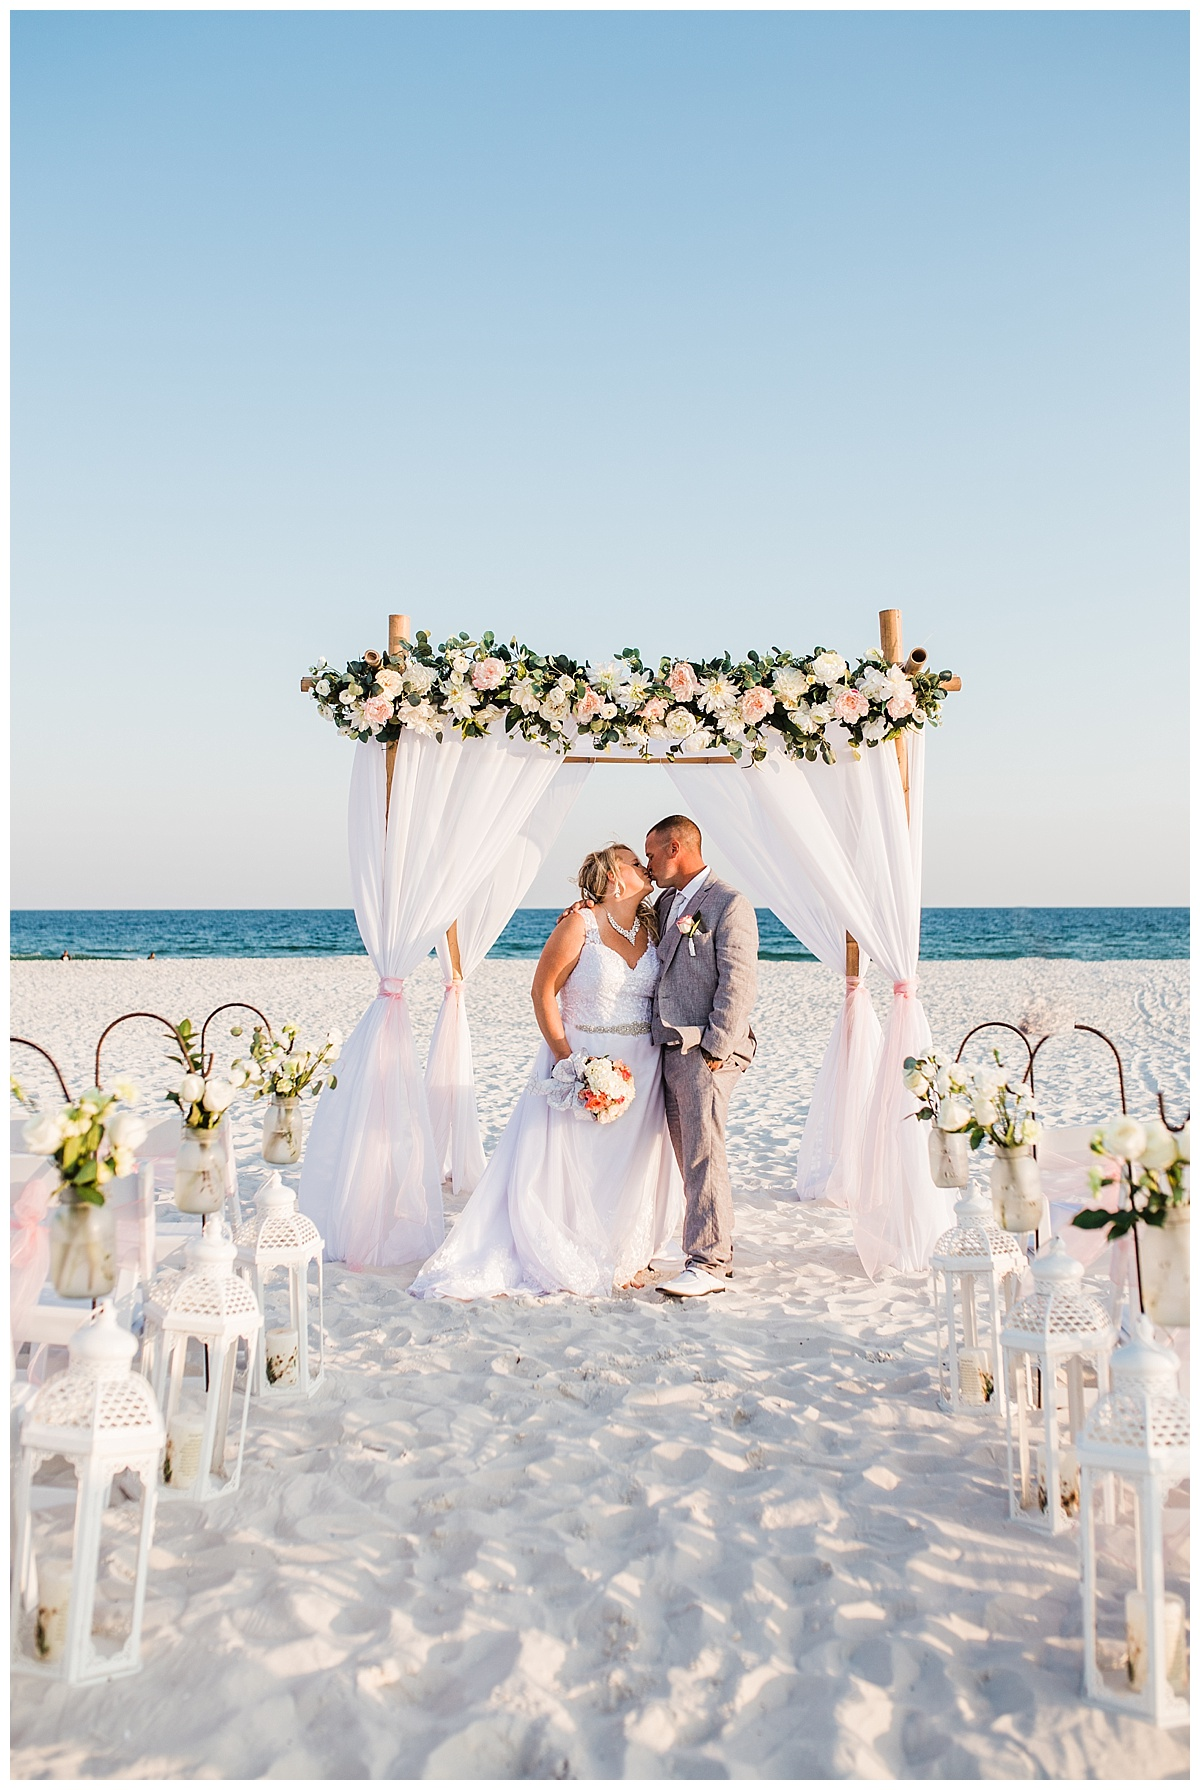 Stress Free Weddings